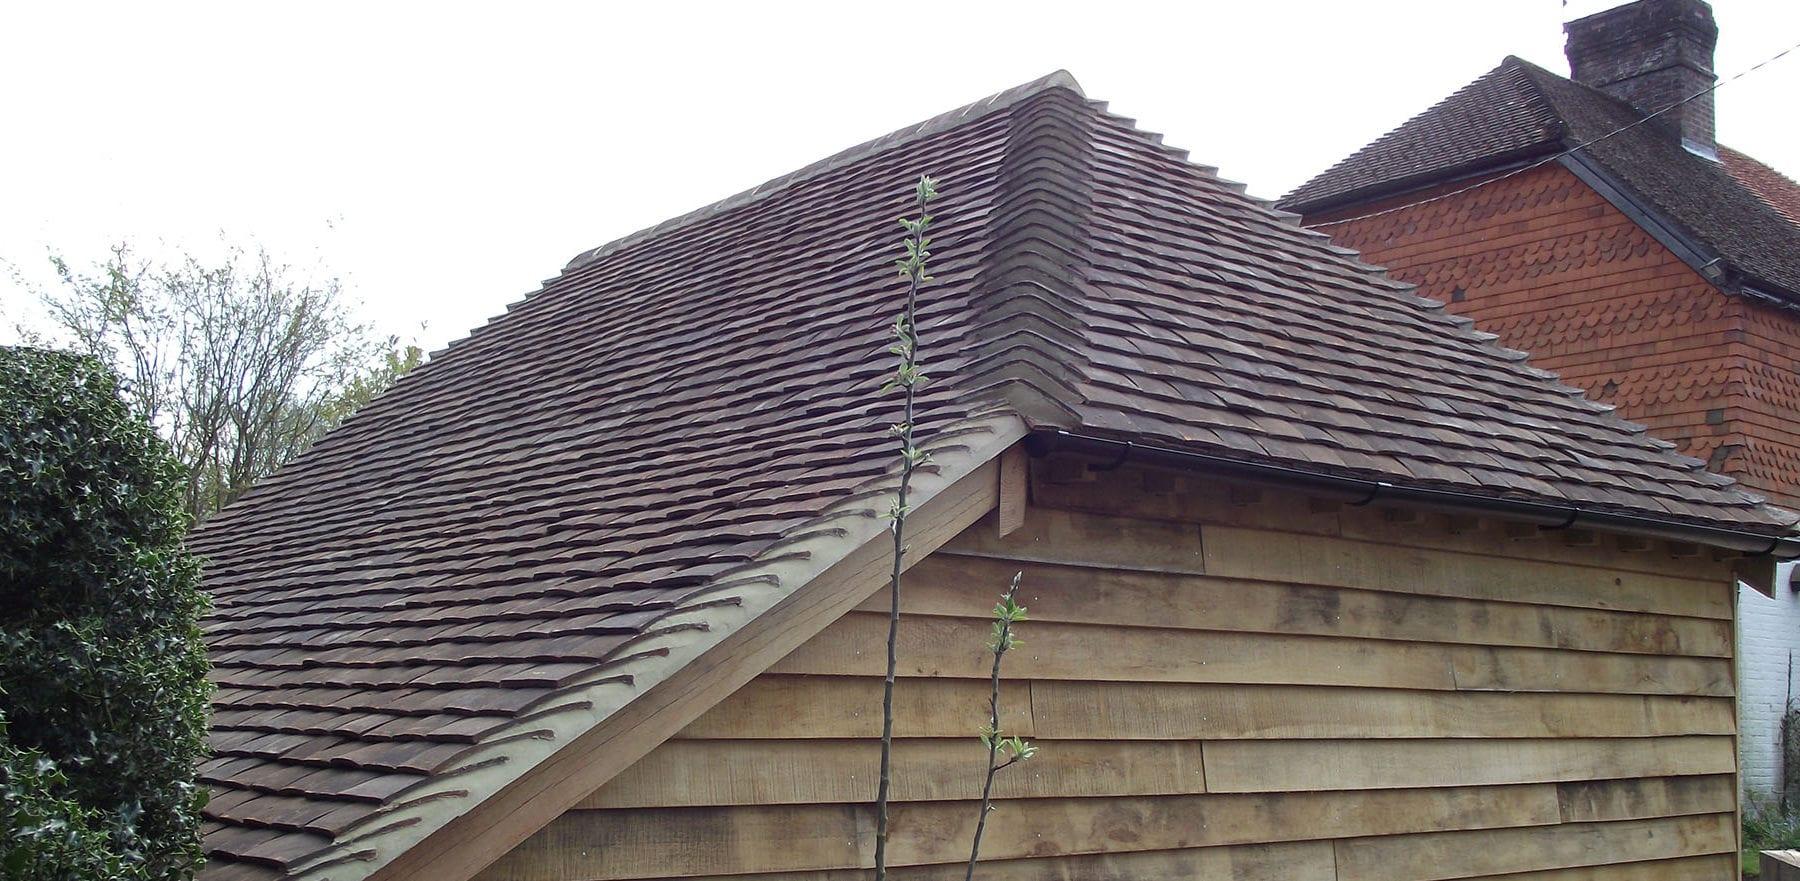 Lifestiles - Handmade Restoration Clay Roof Tiles - Cart Lodge, England 2